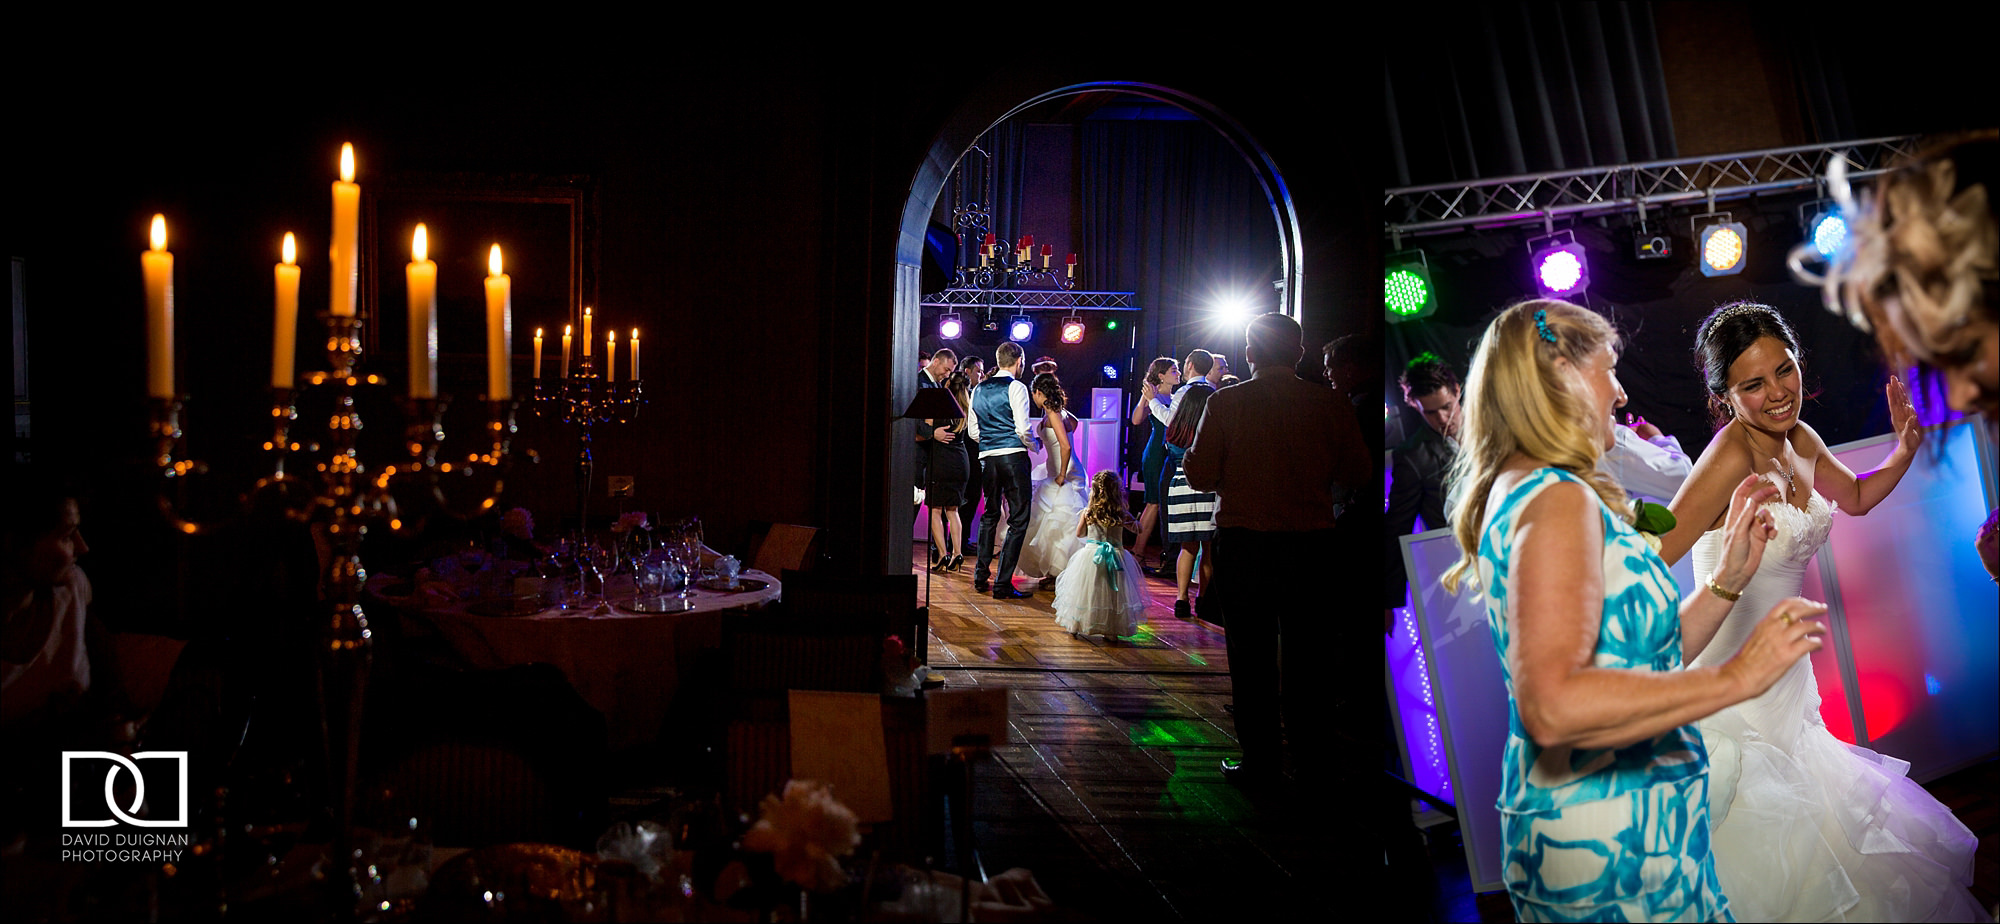 dublin wedding photographer david duignan photography wedding photos 0061